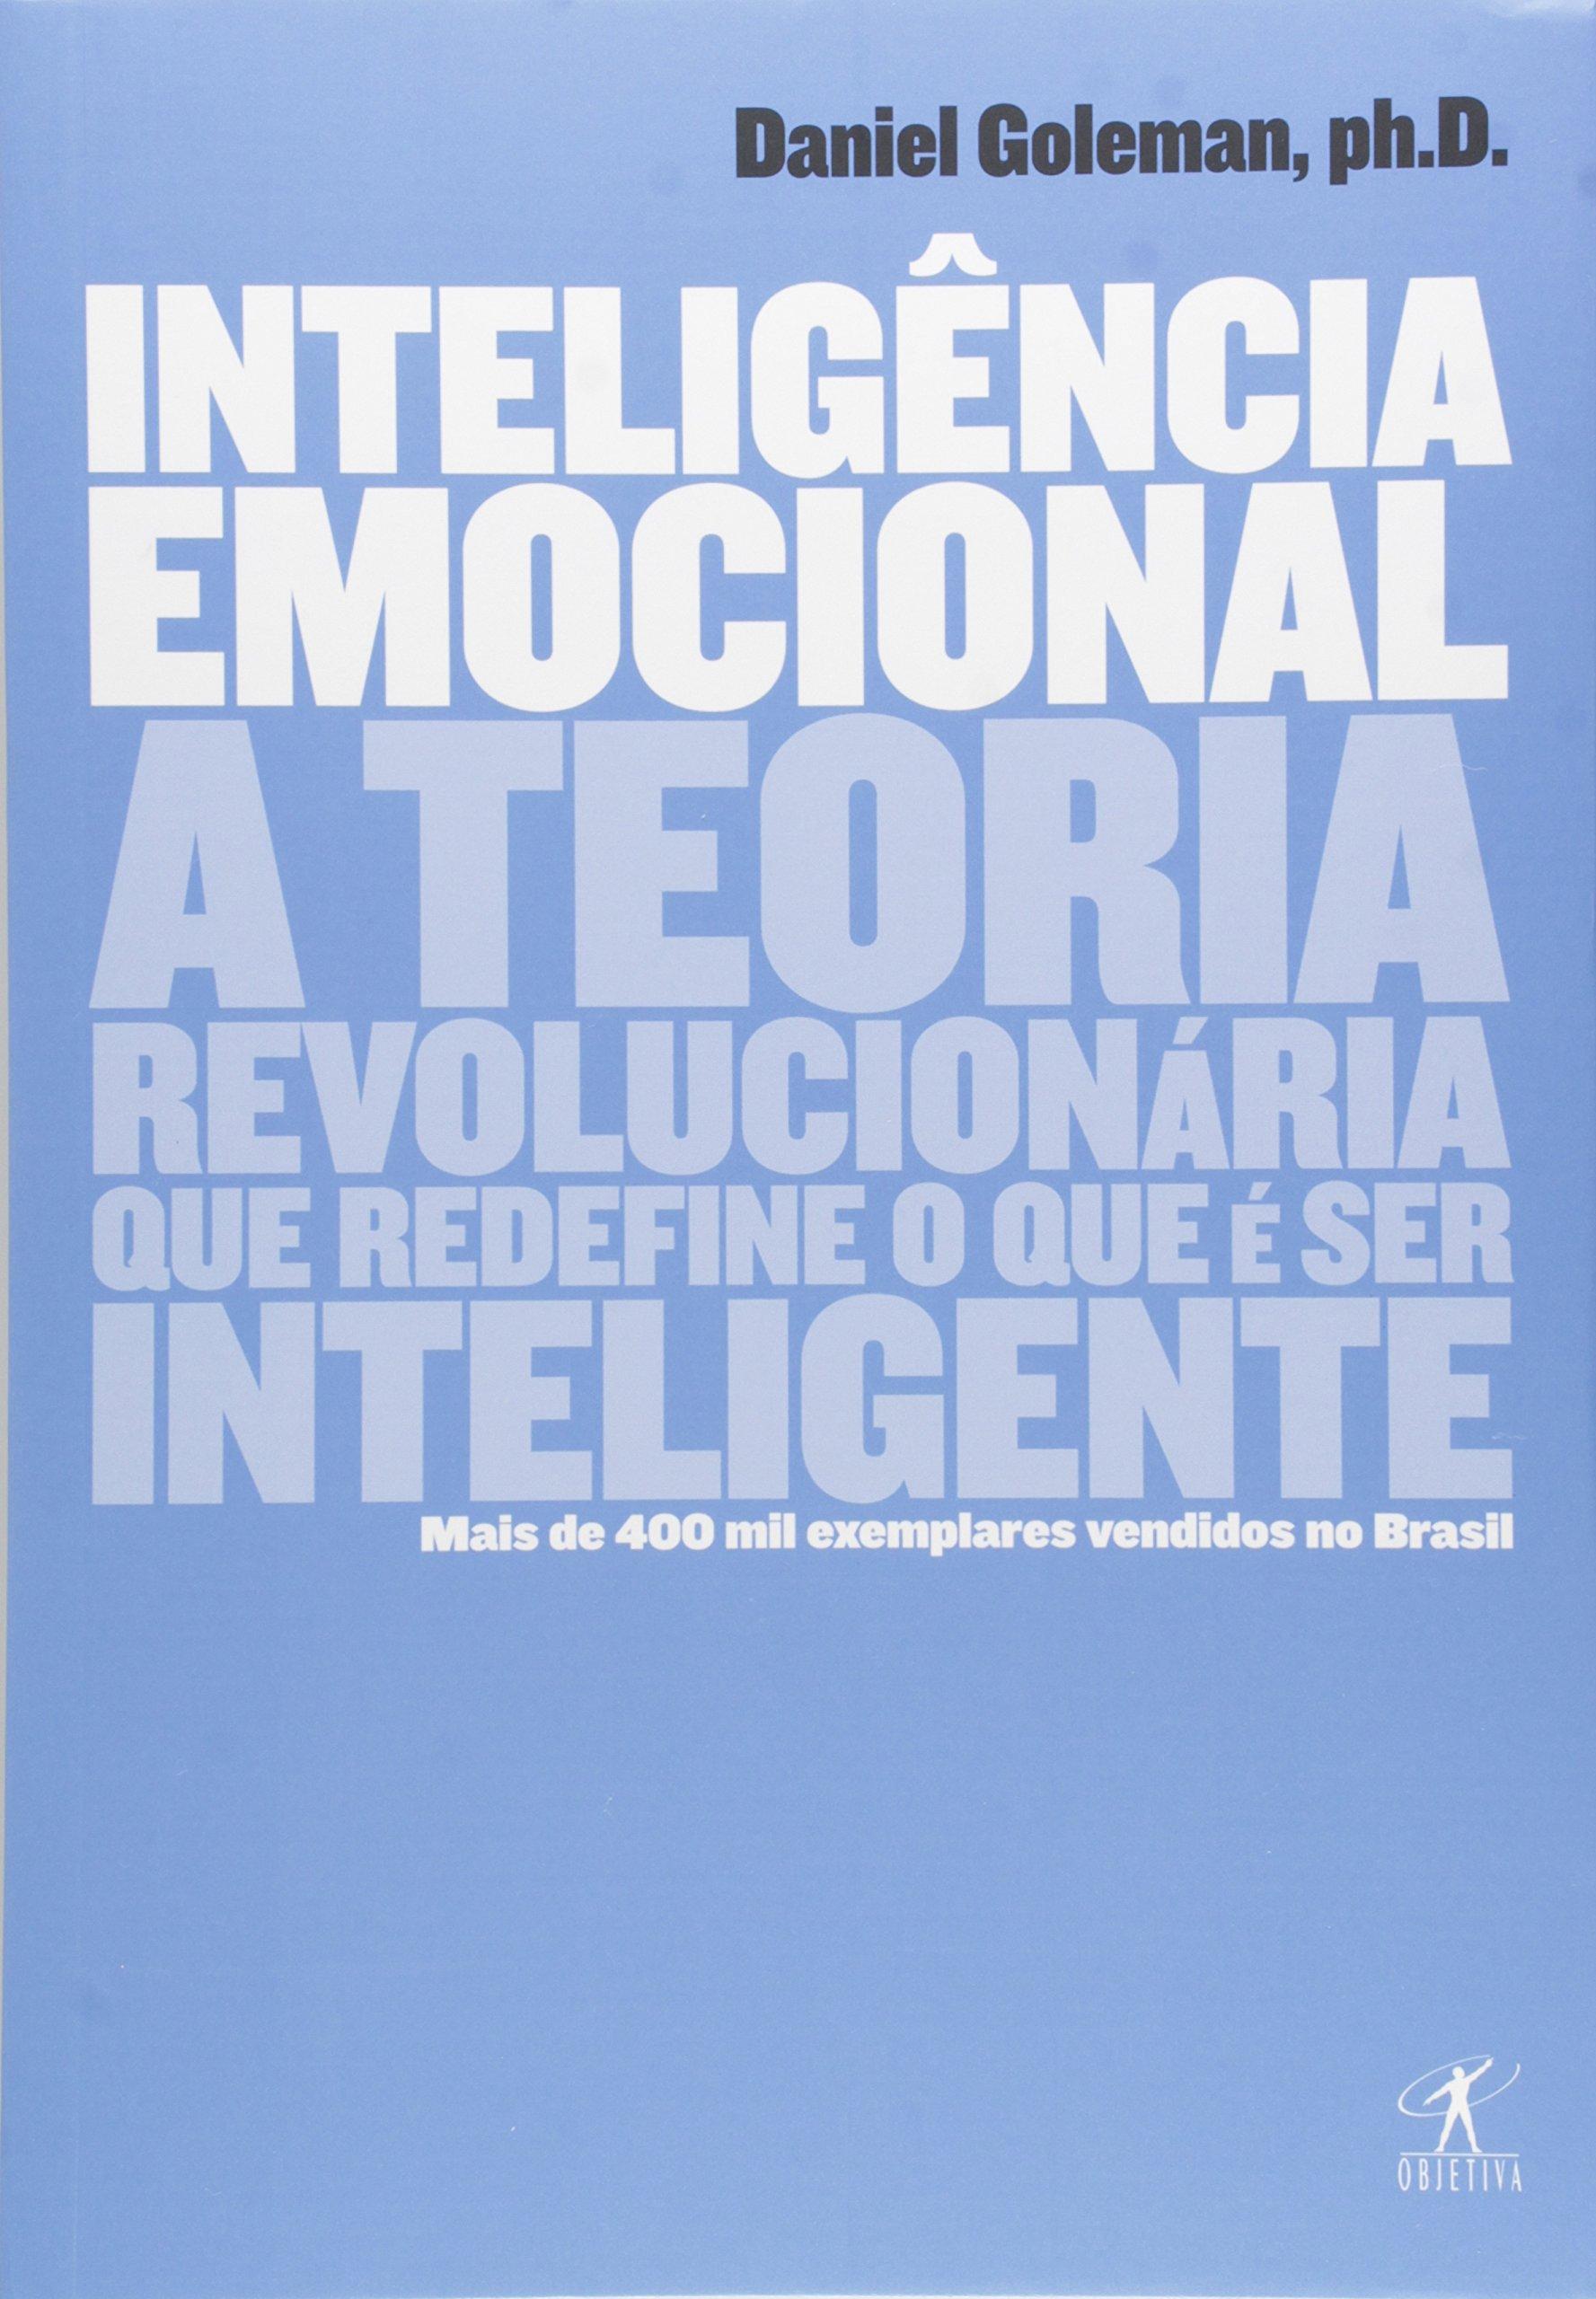 INTELIGENCIA DANIEL GOLEMAN DOWNLOAD PDF GRATUITO EMOCIONAL LIVRO